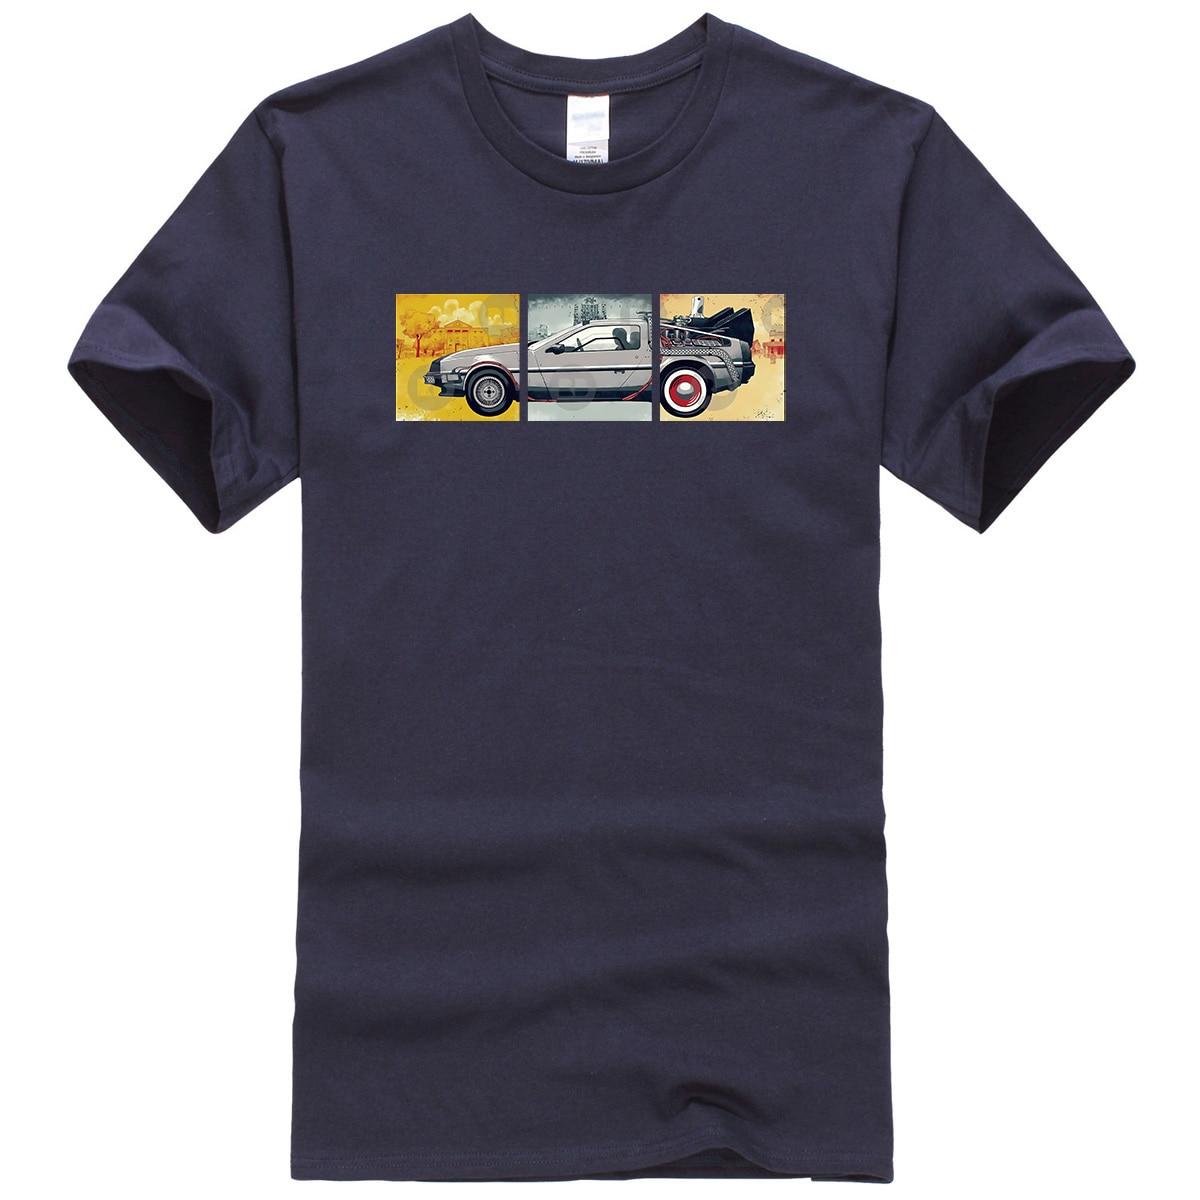 Back To The Future Print T Shirt Male Summer Short Sleeve Tops 2019 Fashion Movies Series Men's T-shirts Hip Hop Top Tee Shirts